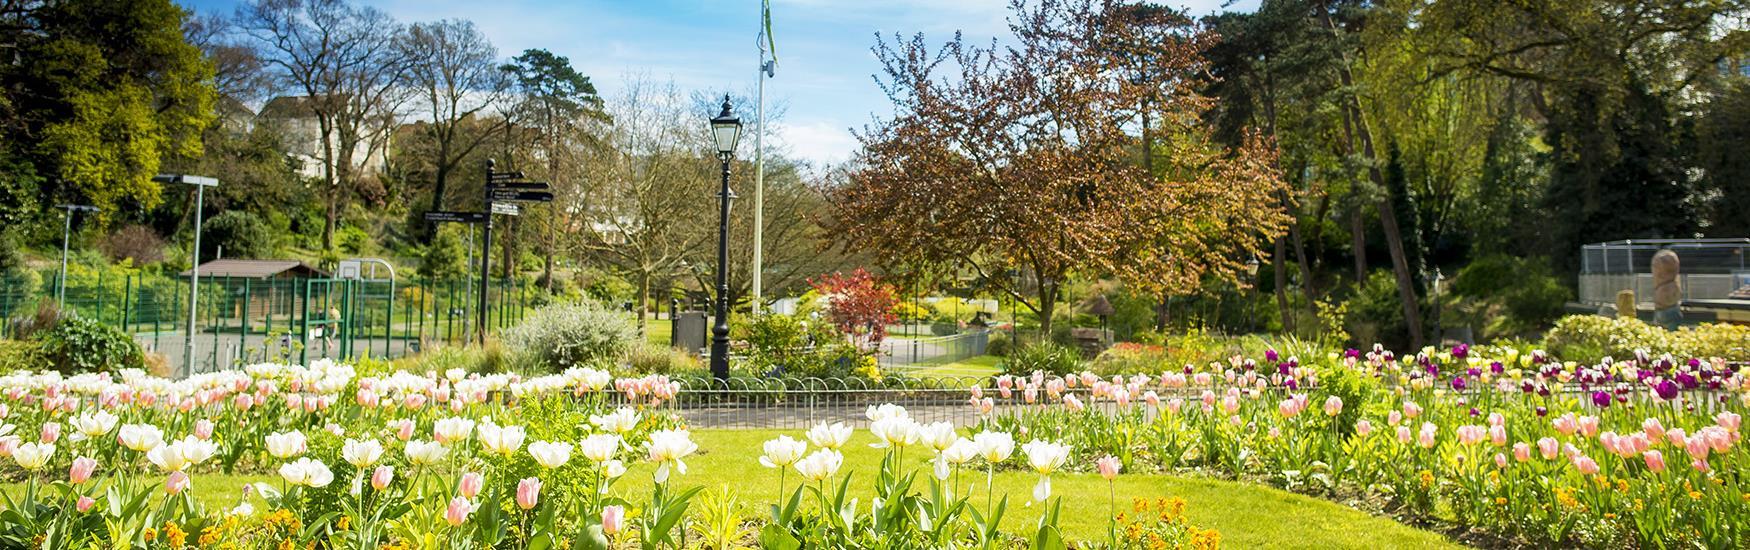 Tranquil walk in Boscombe Chine Gardens